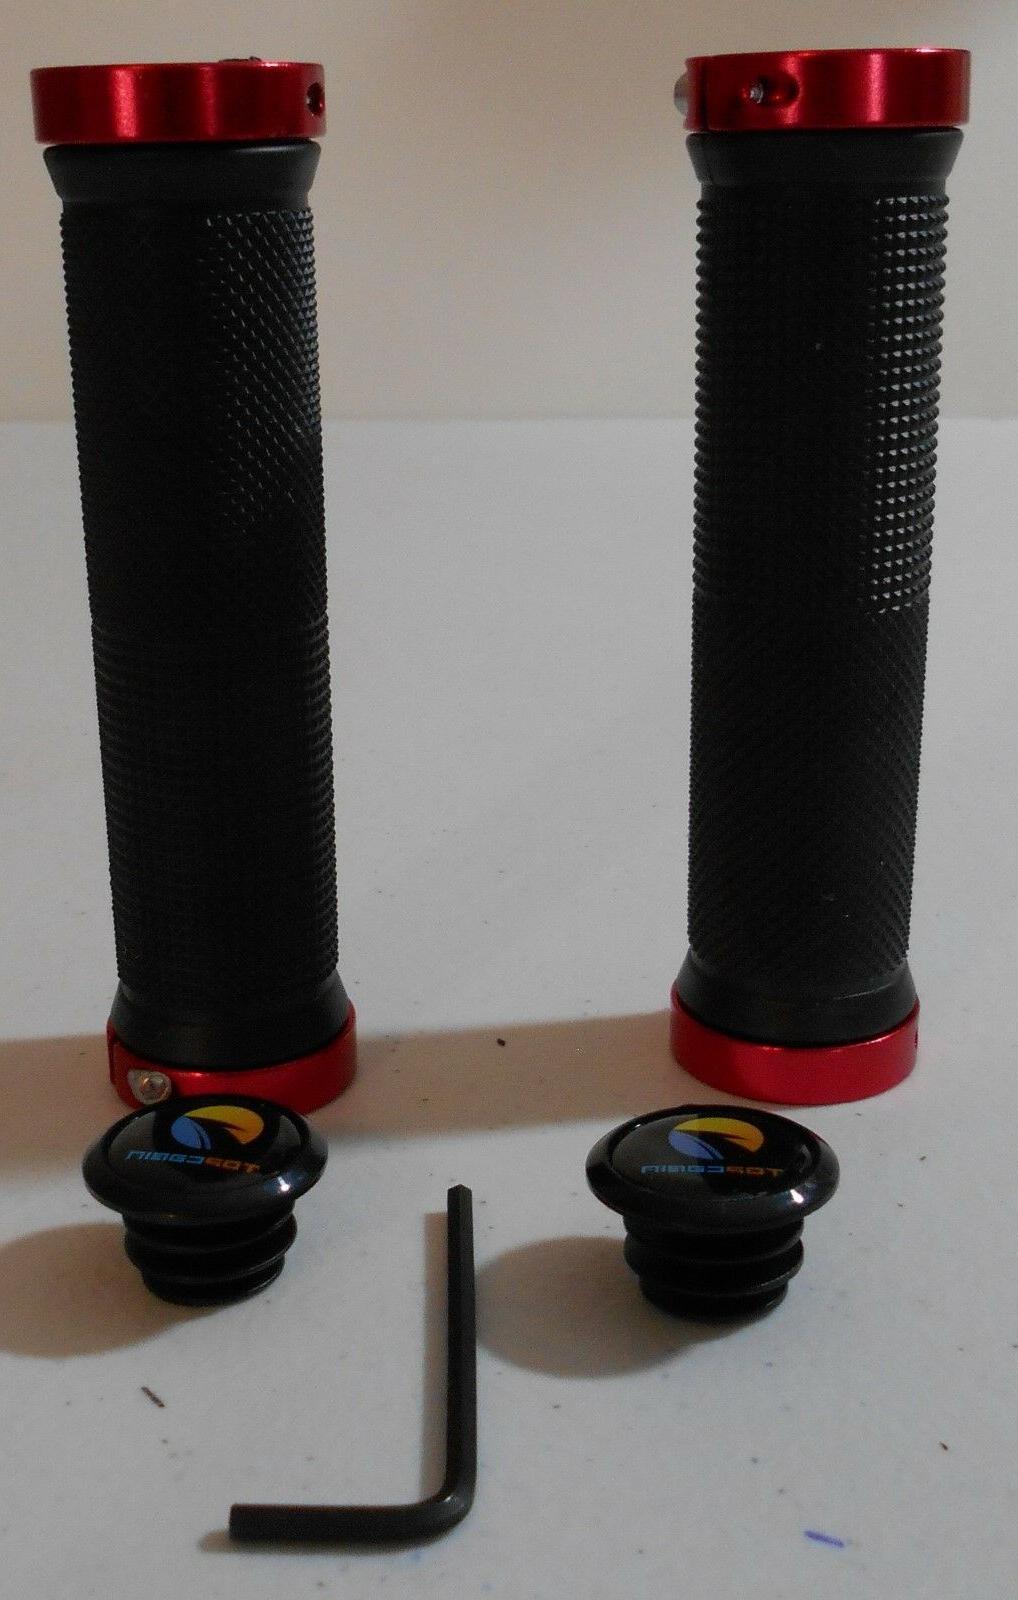 TOPCABIN Bicycle Handlebar Grips Double Lock Anti-Slip Desig